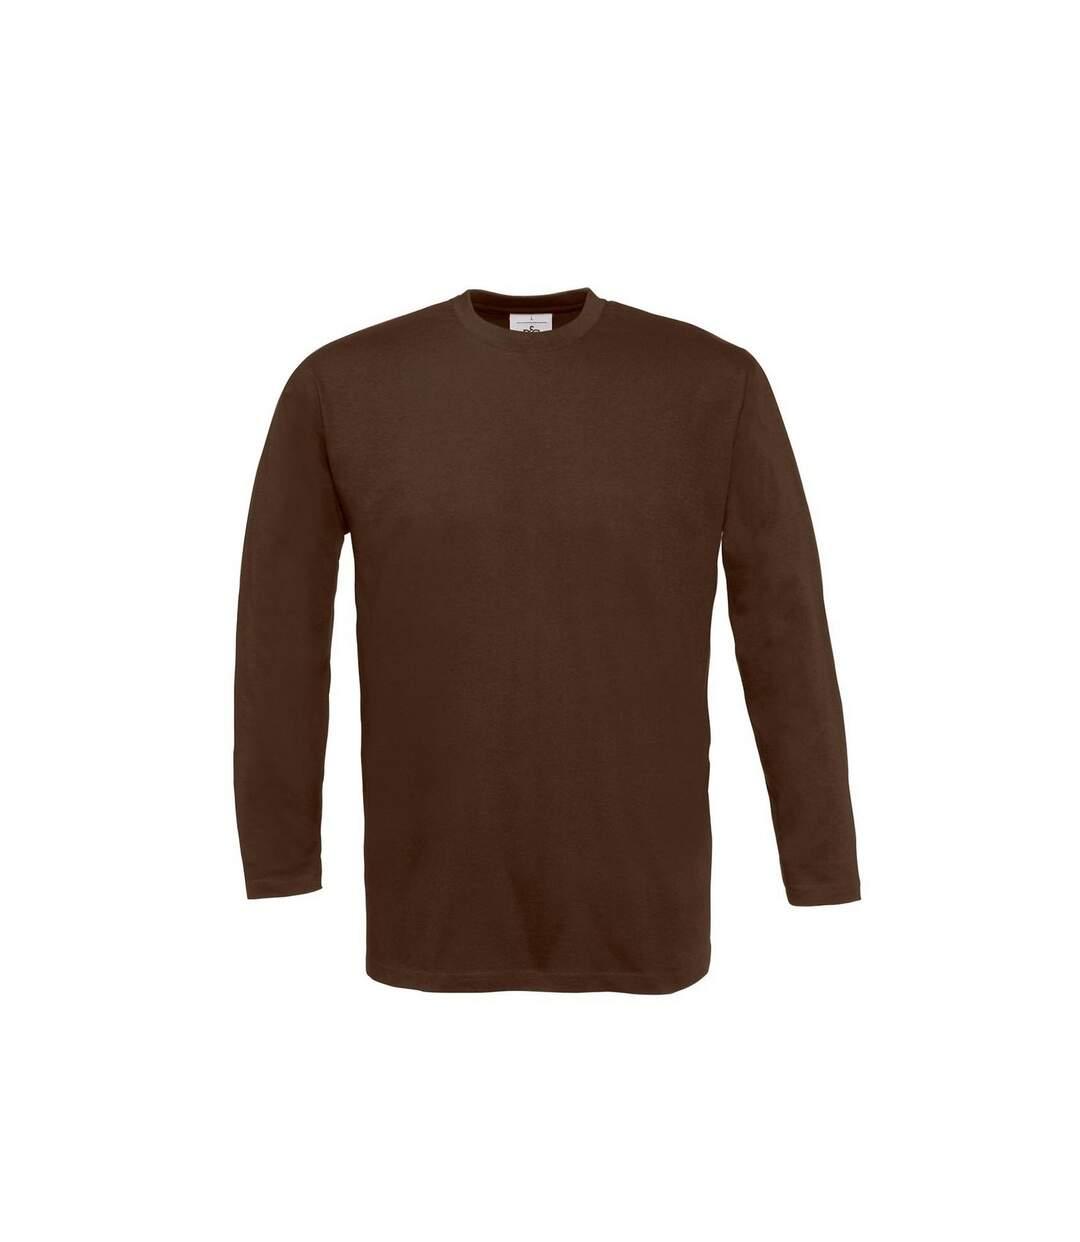 B&C Mens Exact Plain Long Sleeve Crew Neck T-Shirt (Brown) - UTRW3507